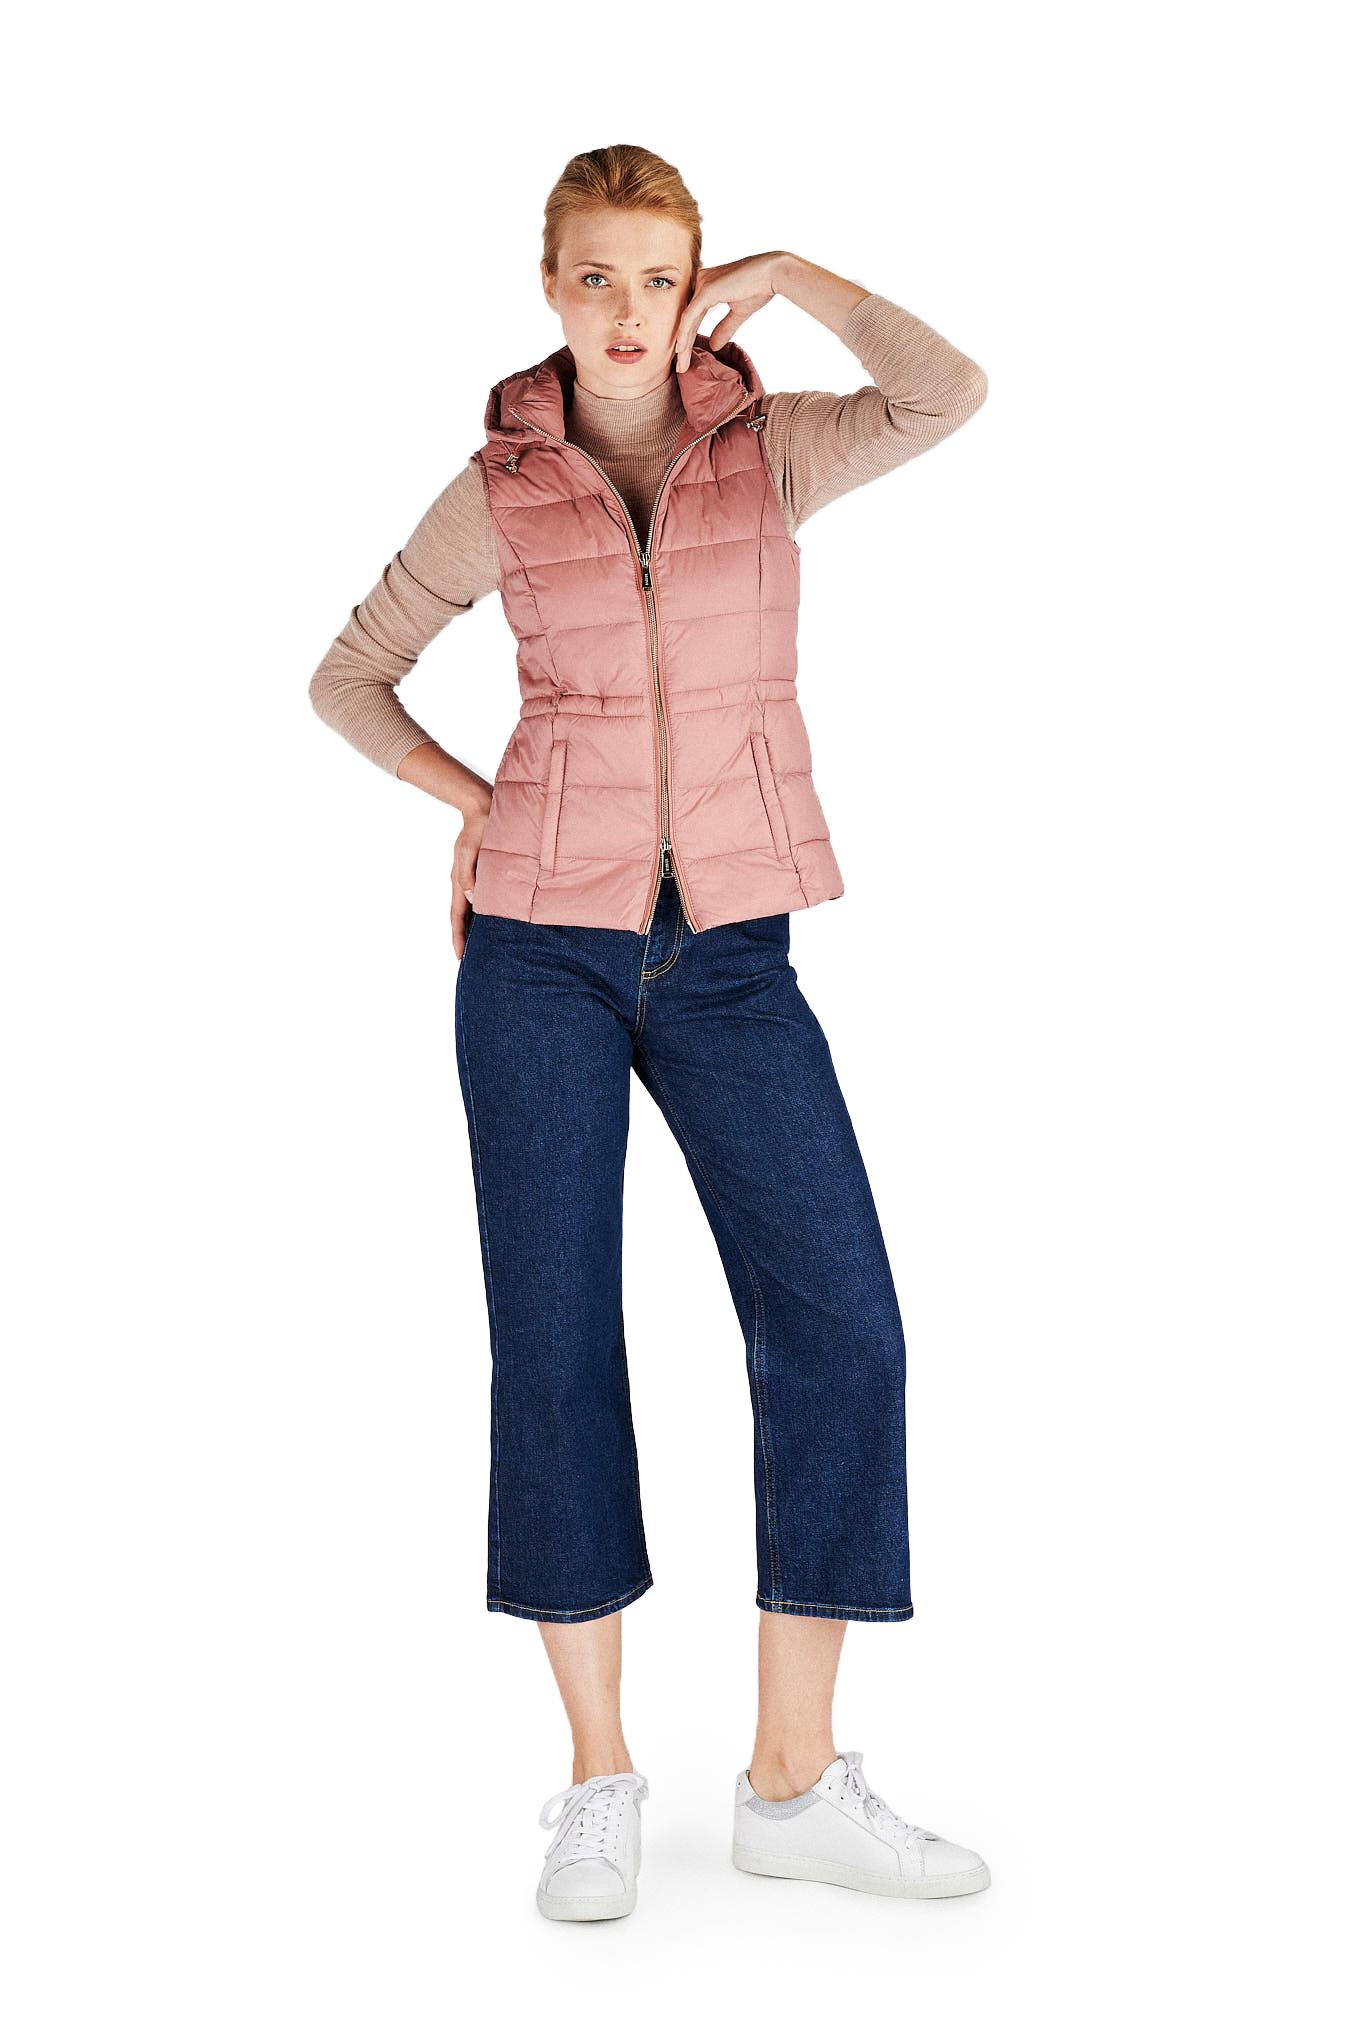 Waist Coat Pink Casual Woman